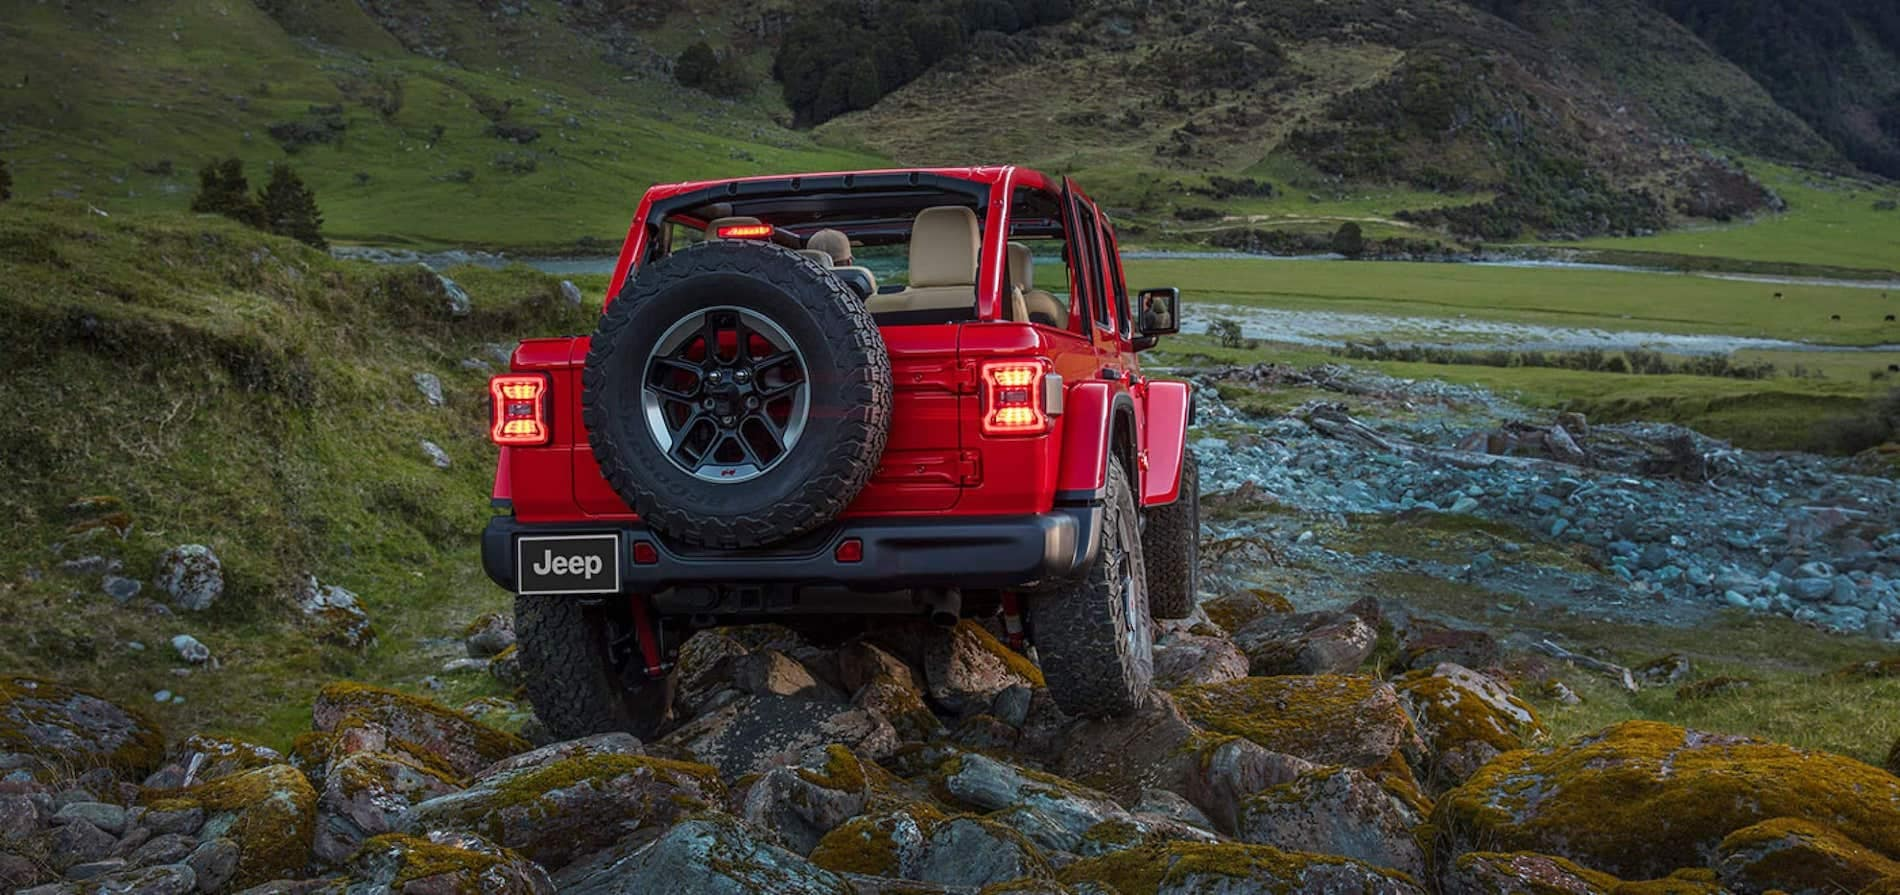 2021 Jeep Wrangler rock climbing adventure